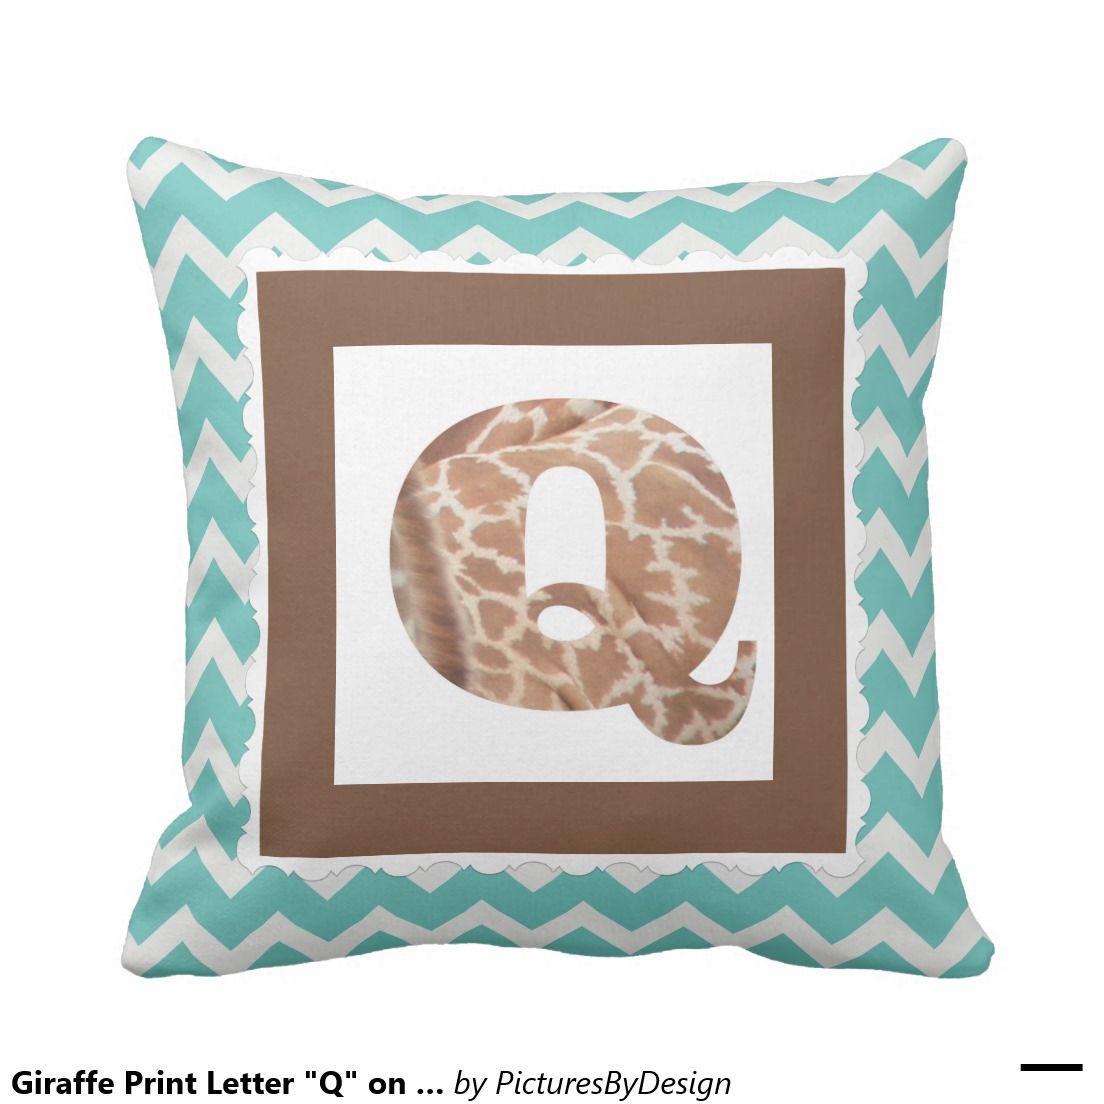 "Giraffe Print Letter ""Q"" on Mint/White Chevron Pillow"